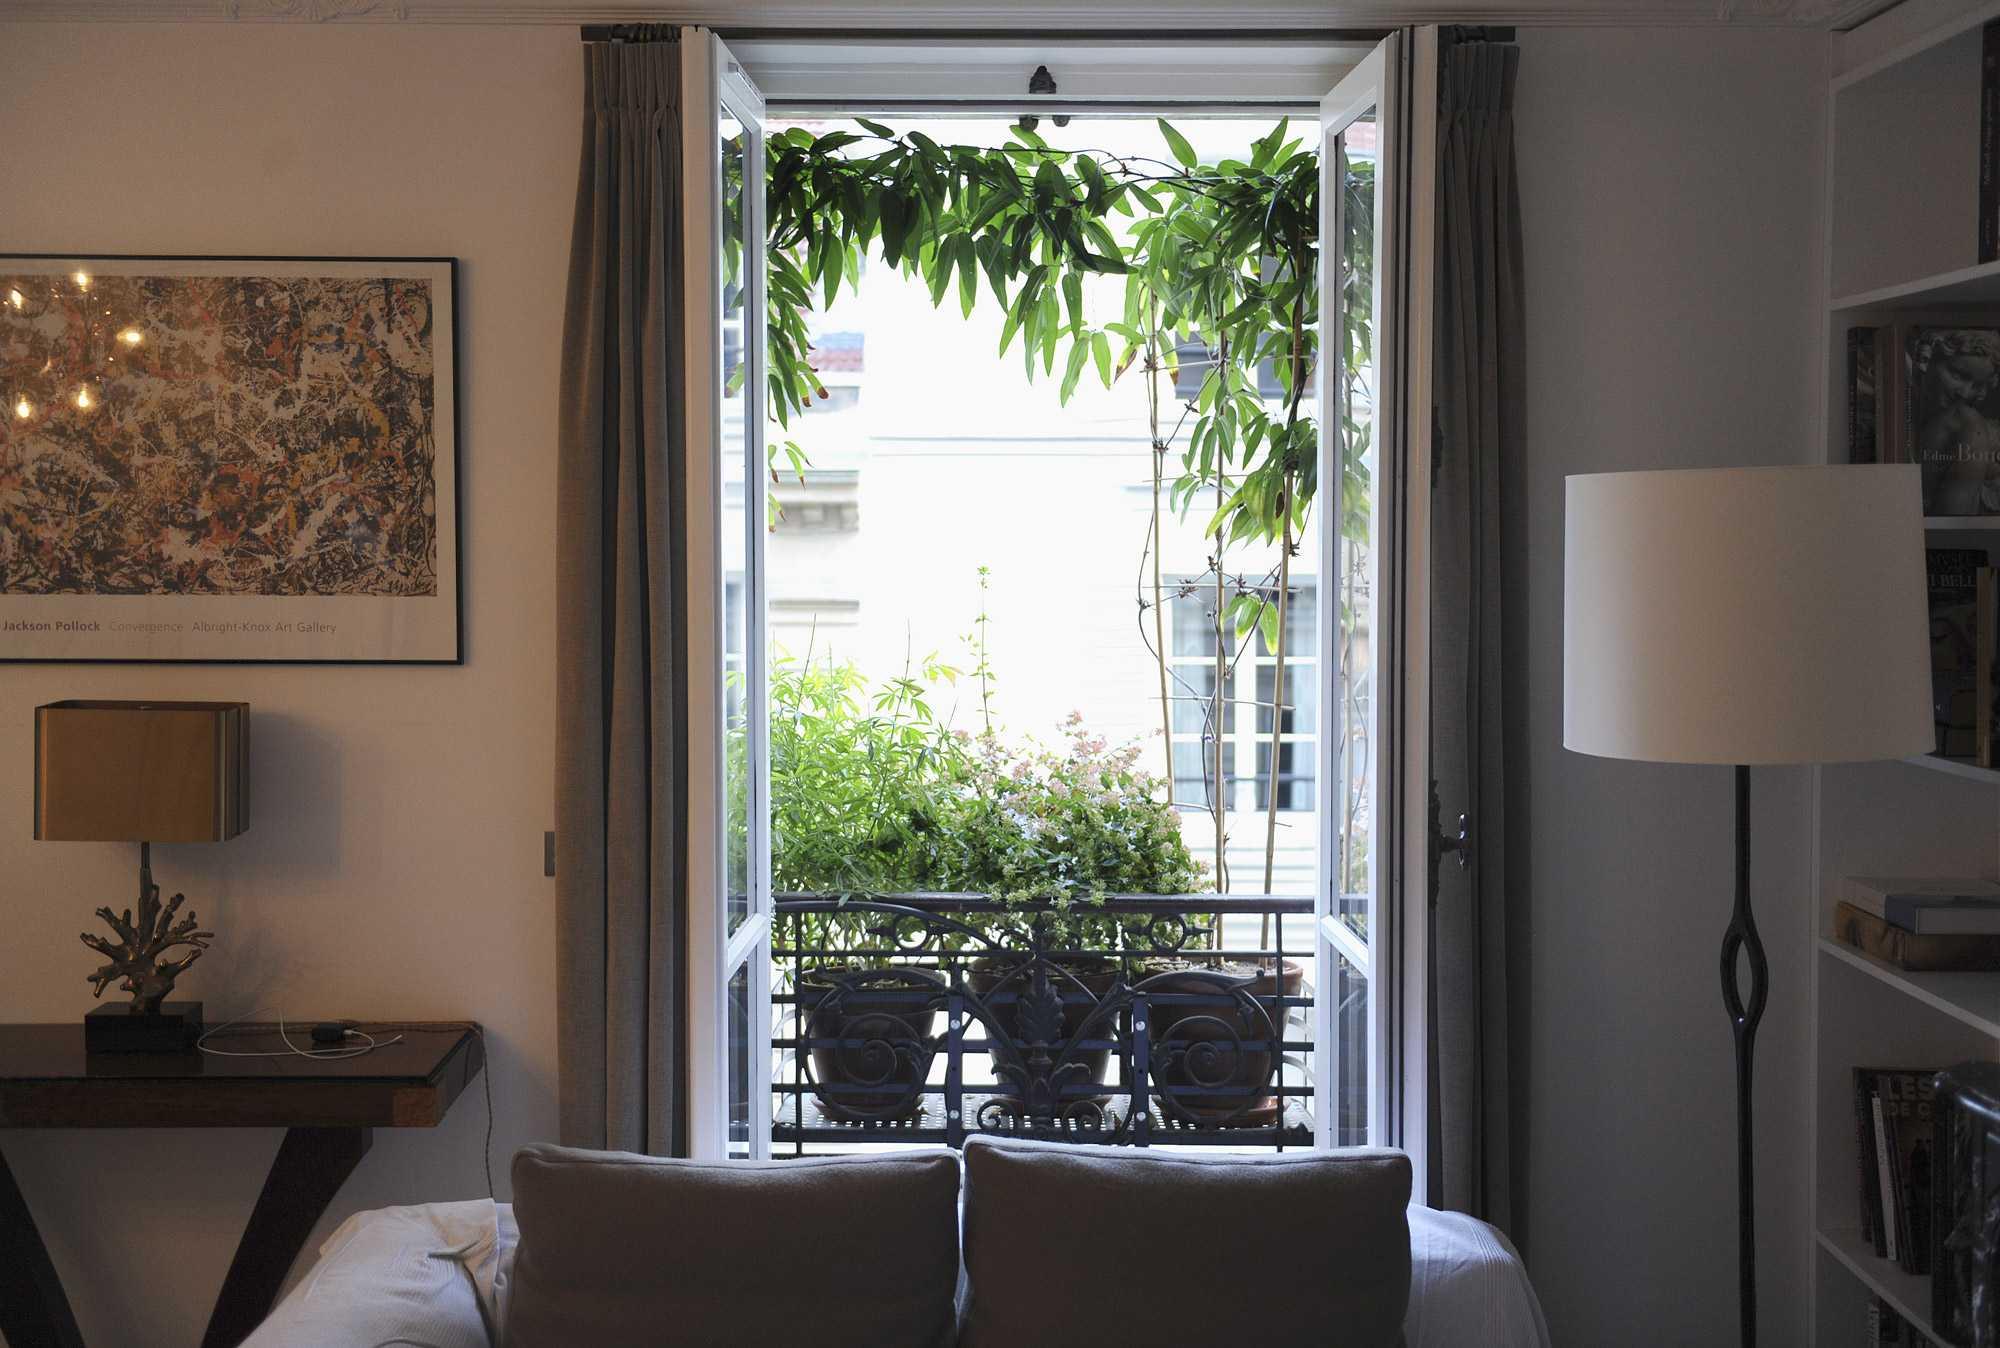 choron 002 le vert soi. Black Bedroom Furniture Sets. Home Design Ideas